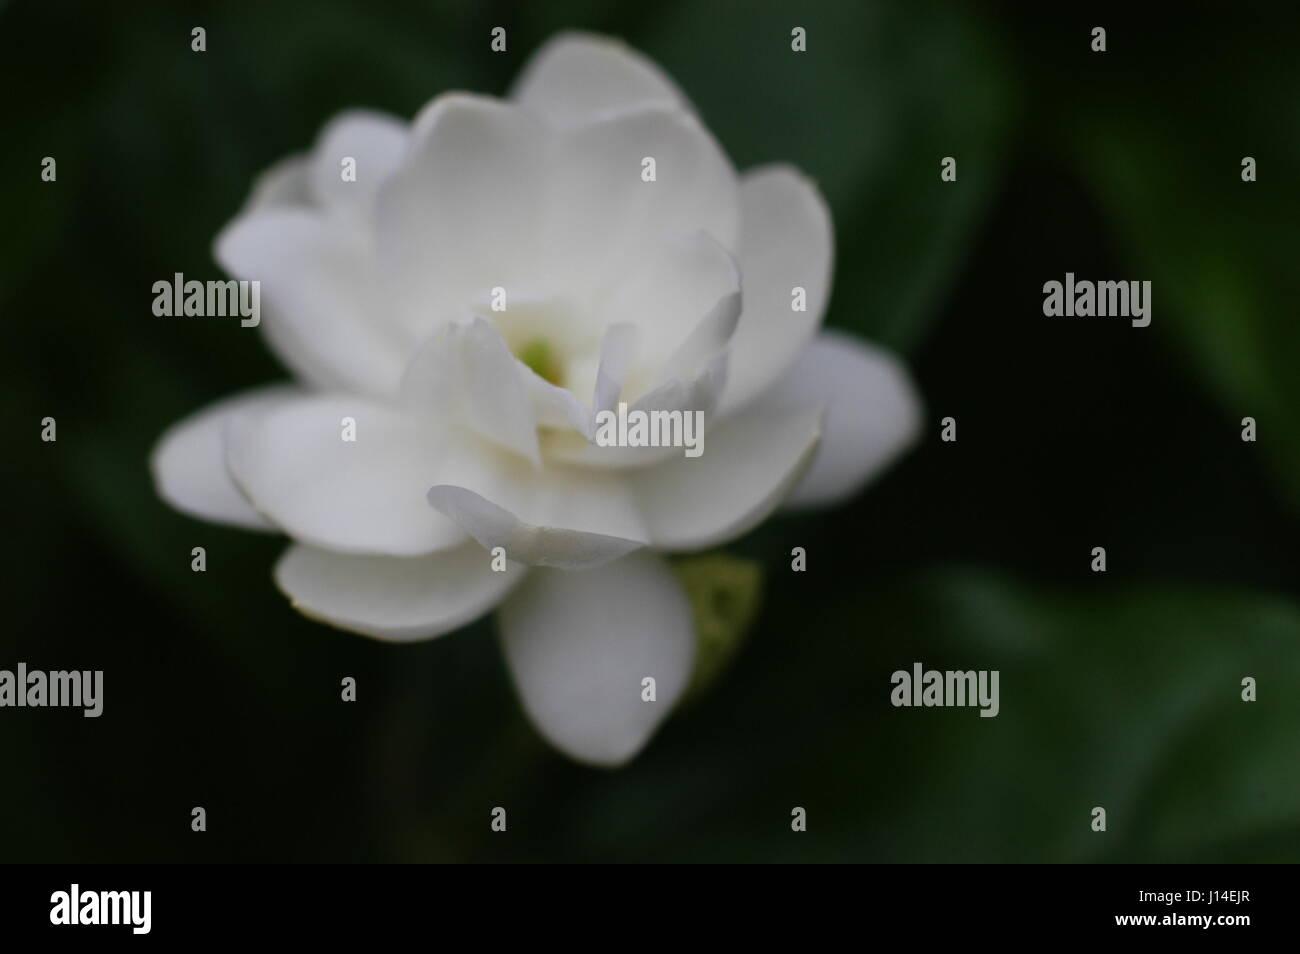 Pikake flower stock photos pikake flower stock images alamy jasmine flower on tree and leaf on nature background stock image izmirmasajfo